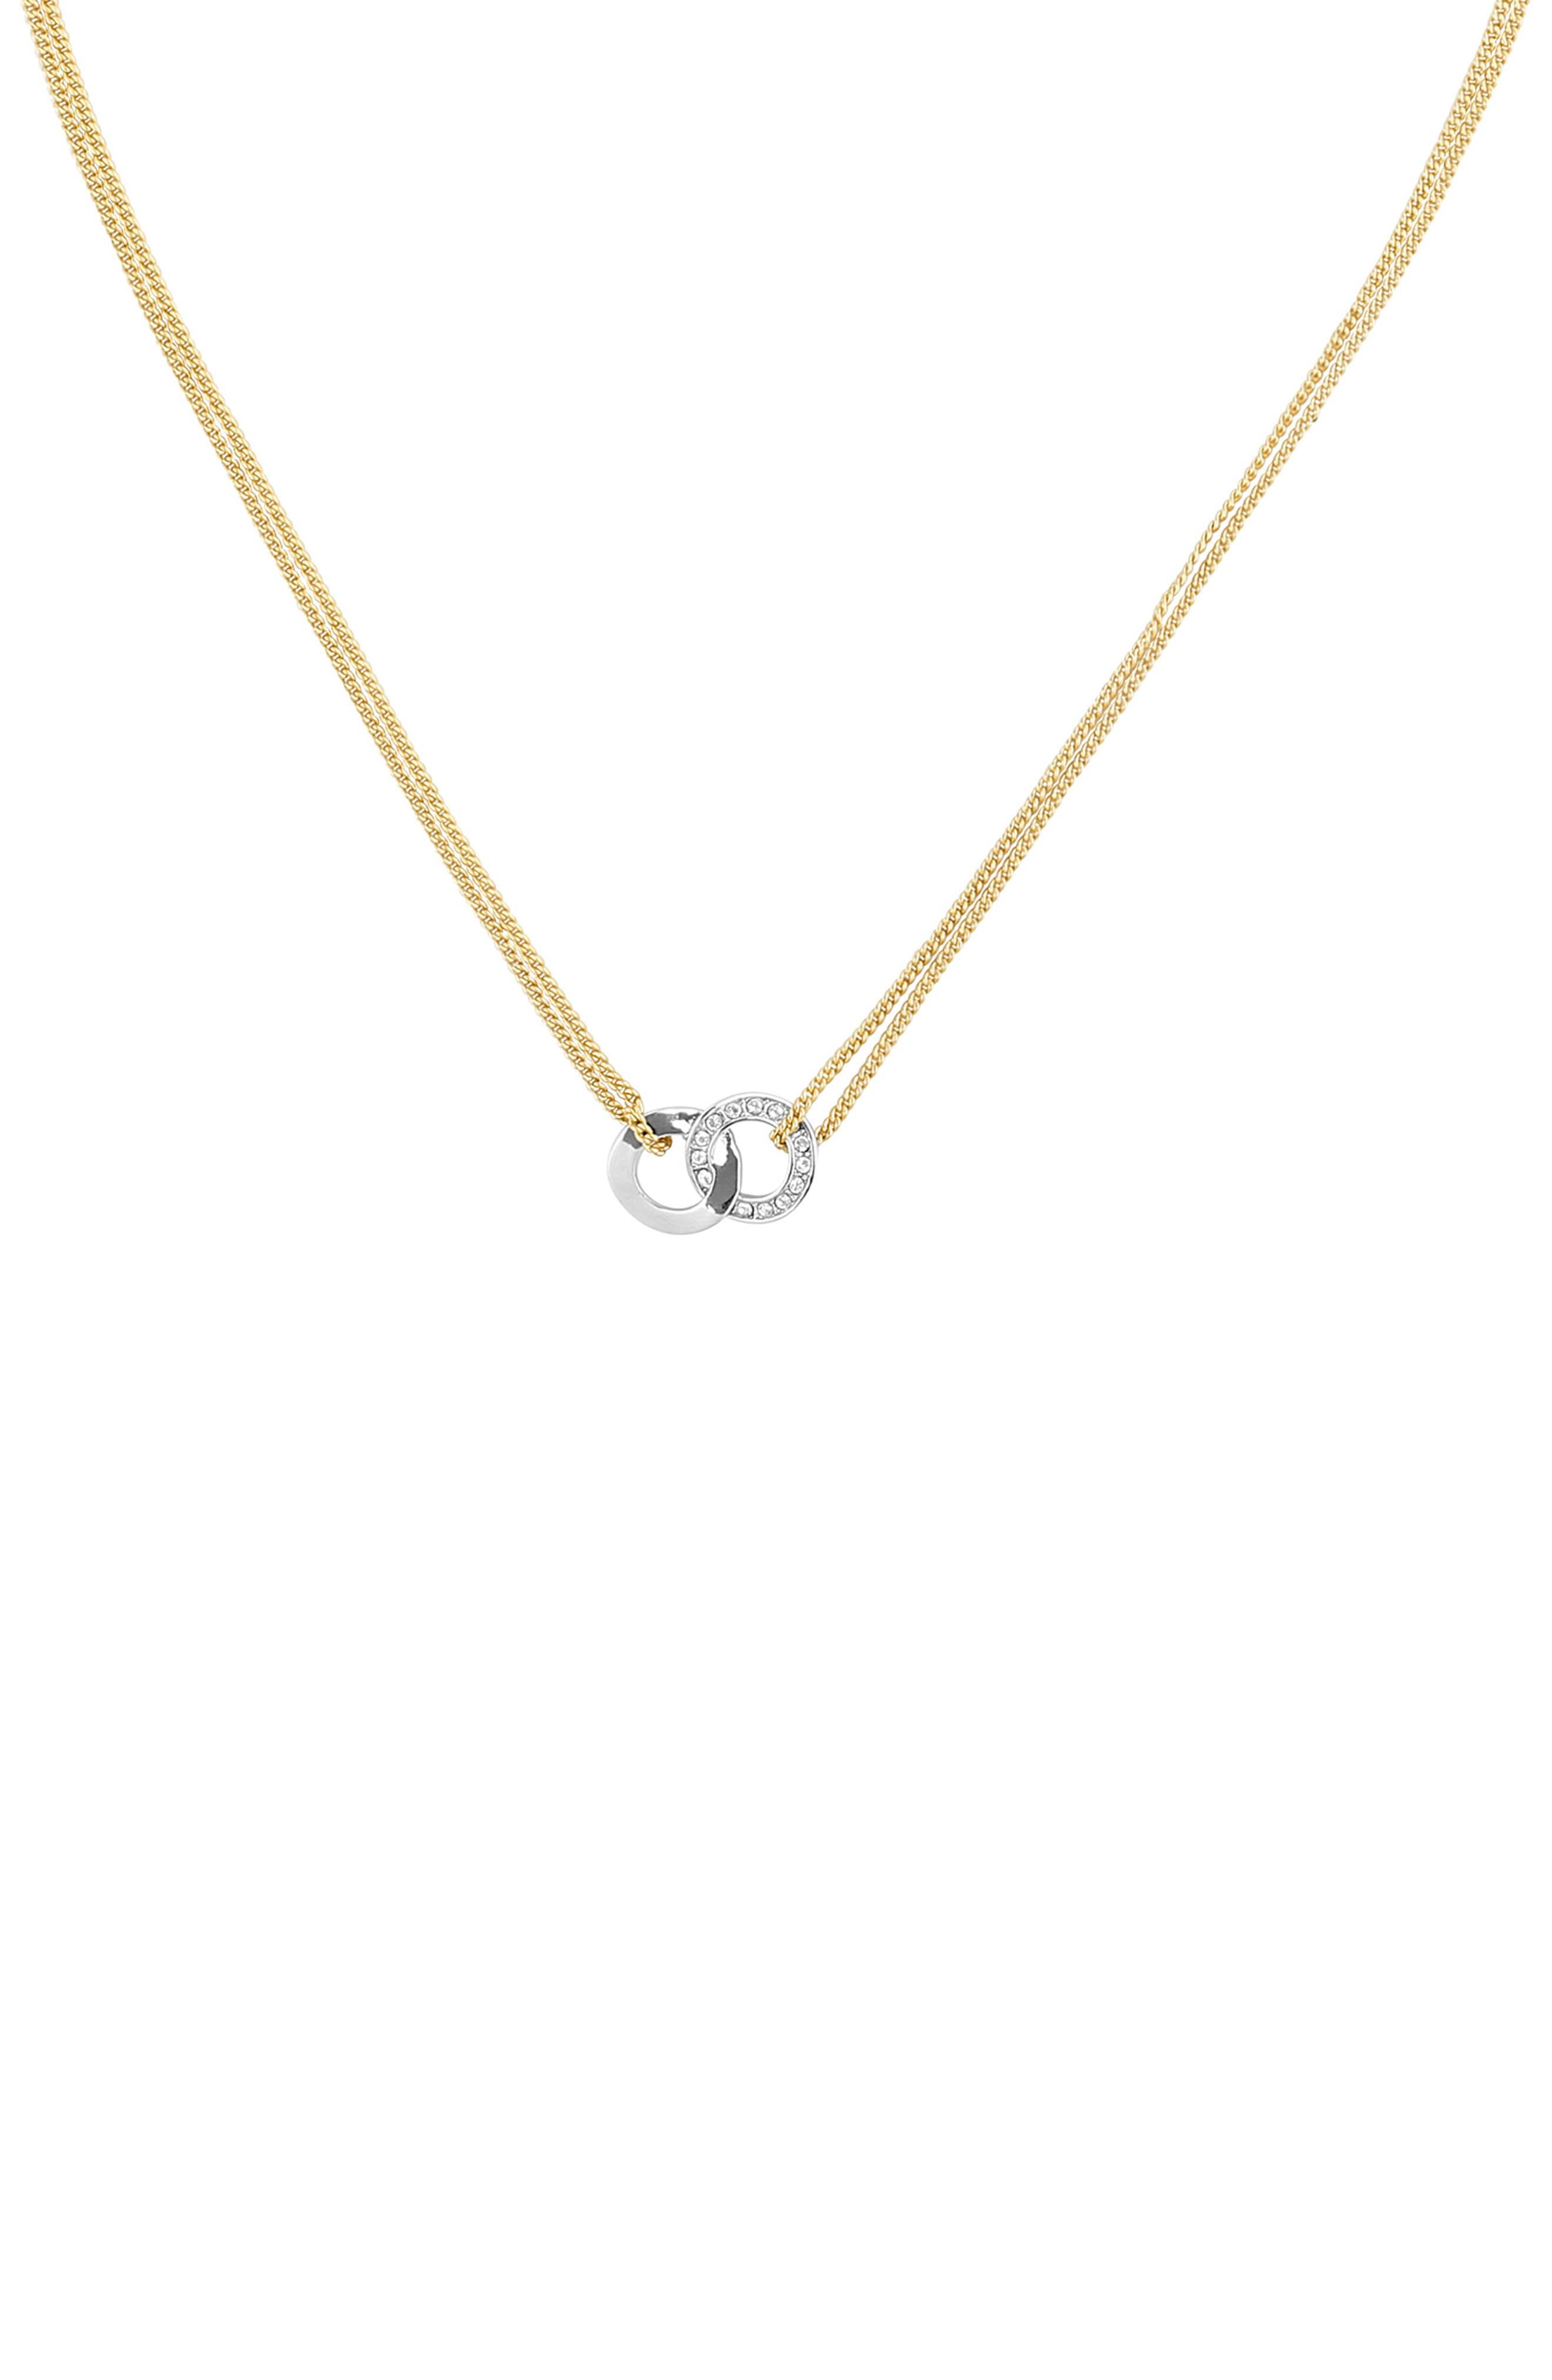 ADORE Interlocking Ring Necklace, Main, color, GOLD/ SILVER